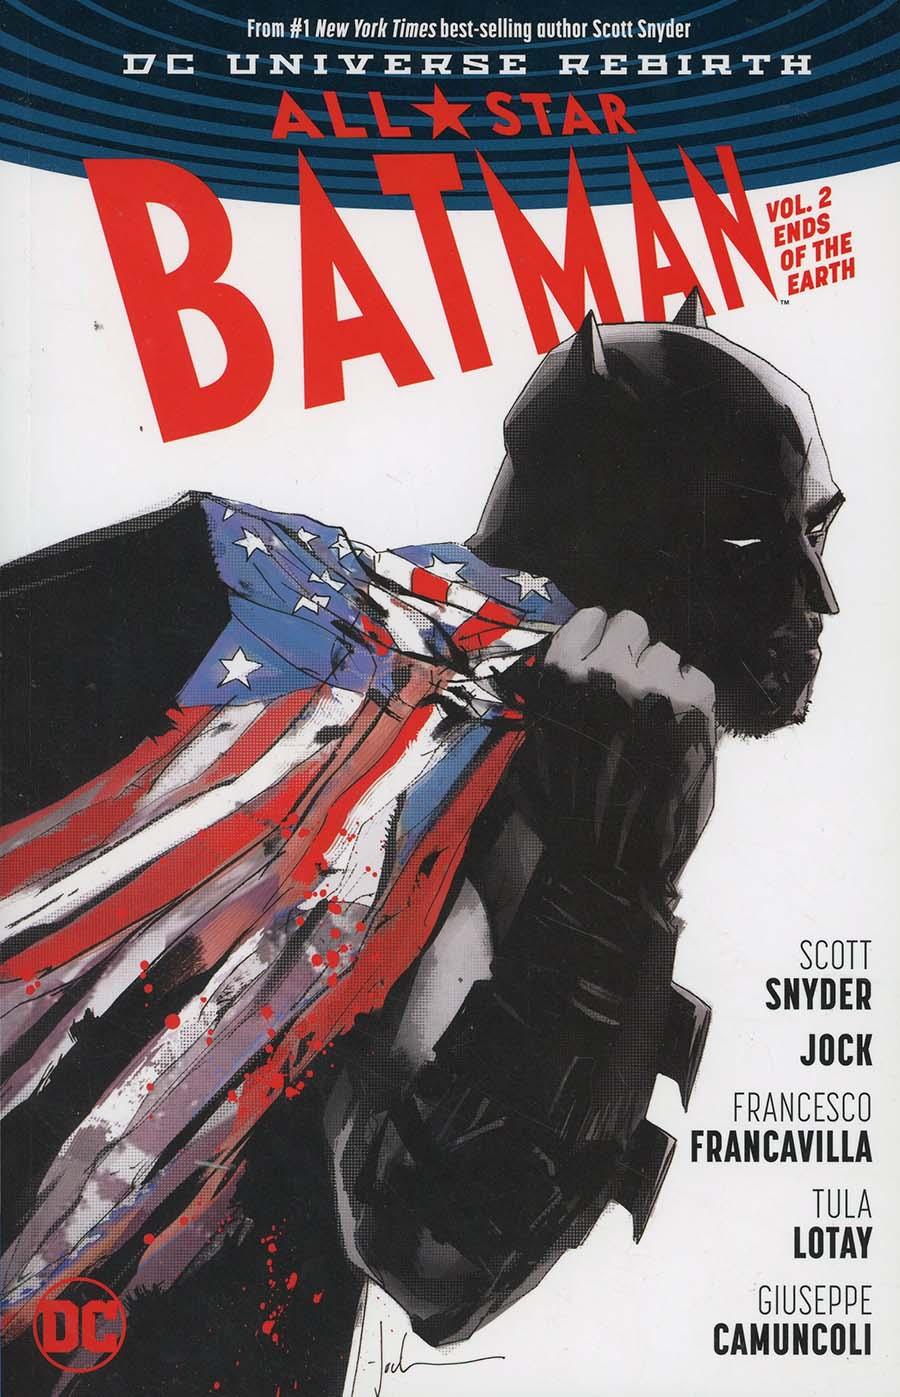 All-Star Batman (Rebirth) Vol 2 Ends Of The Earth TP